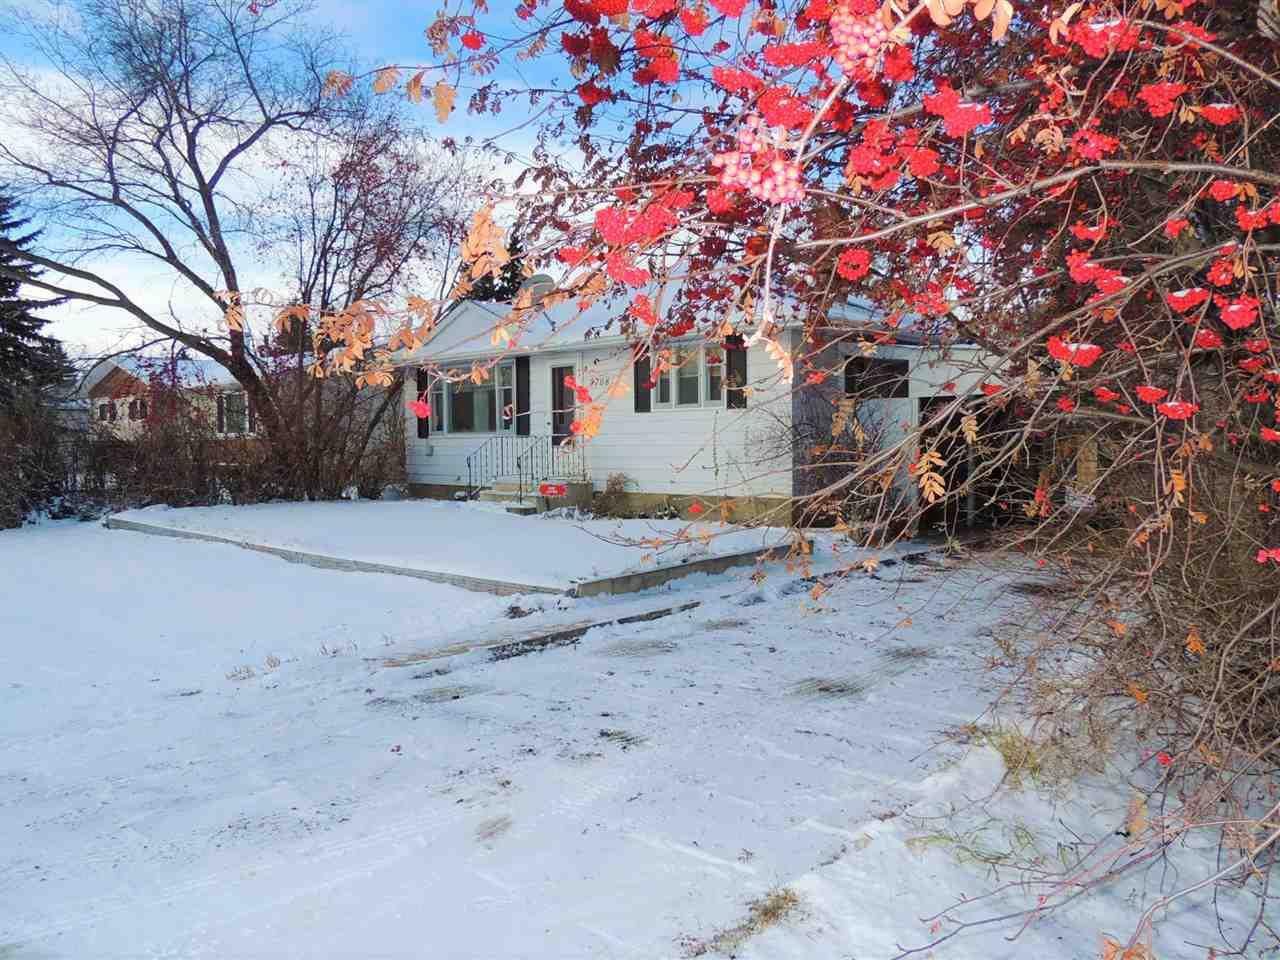 Main Photo: 4708 51 Avenue: Waskatenau House for sale : MLS®# E4135338